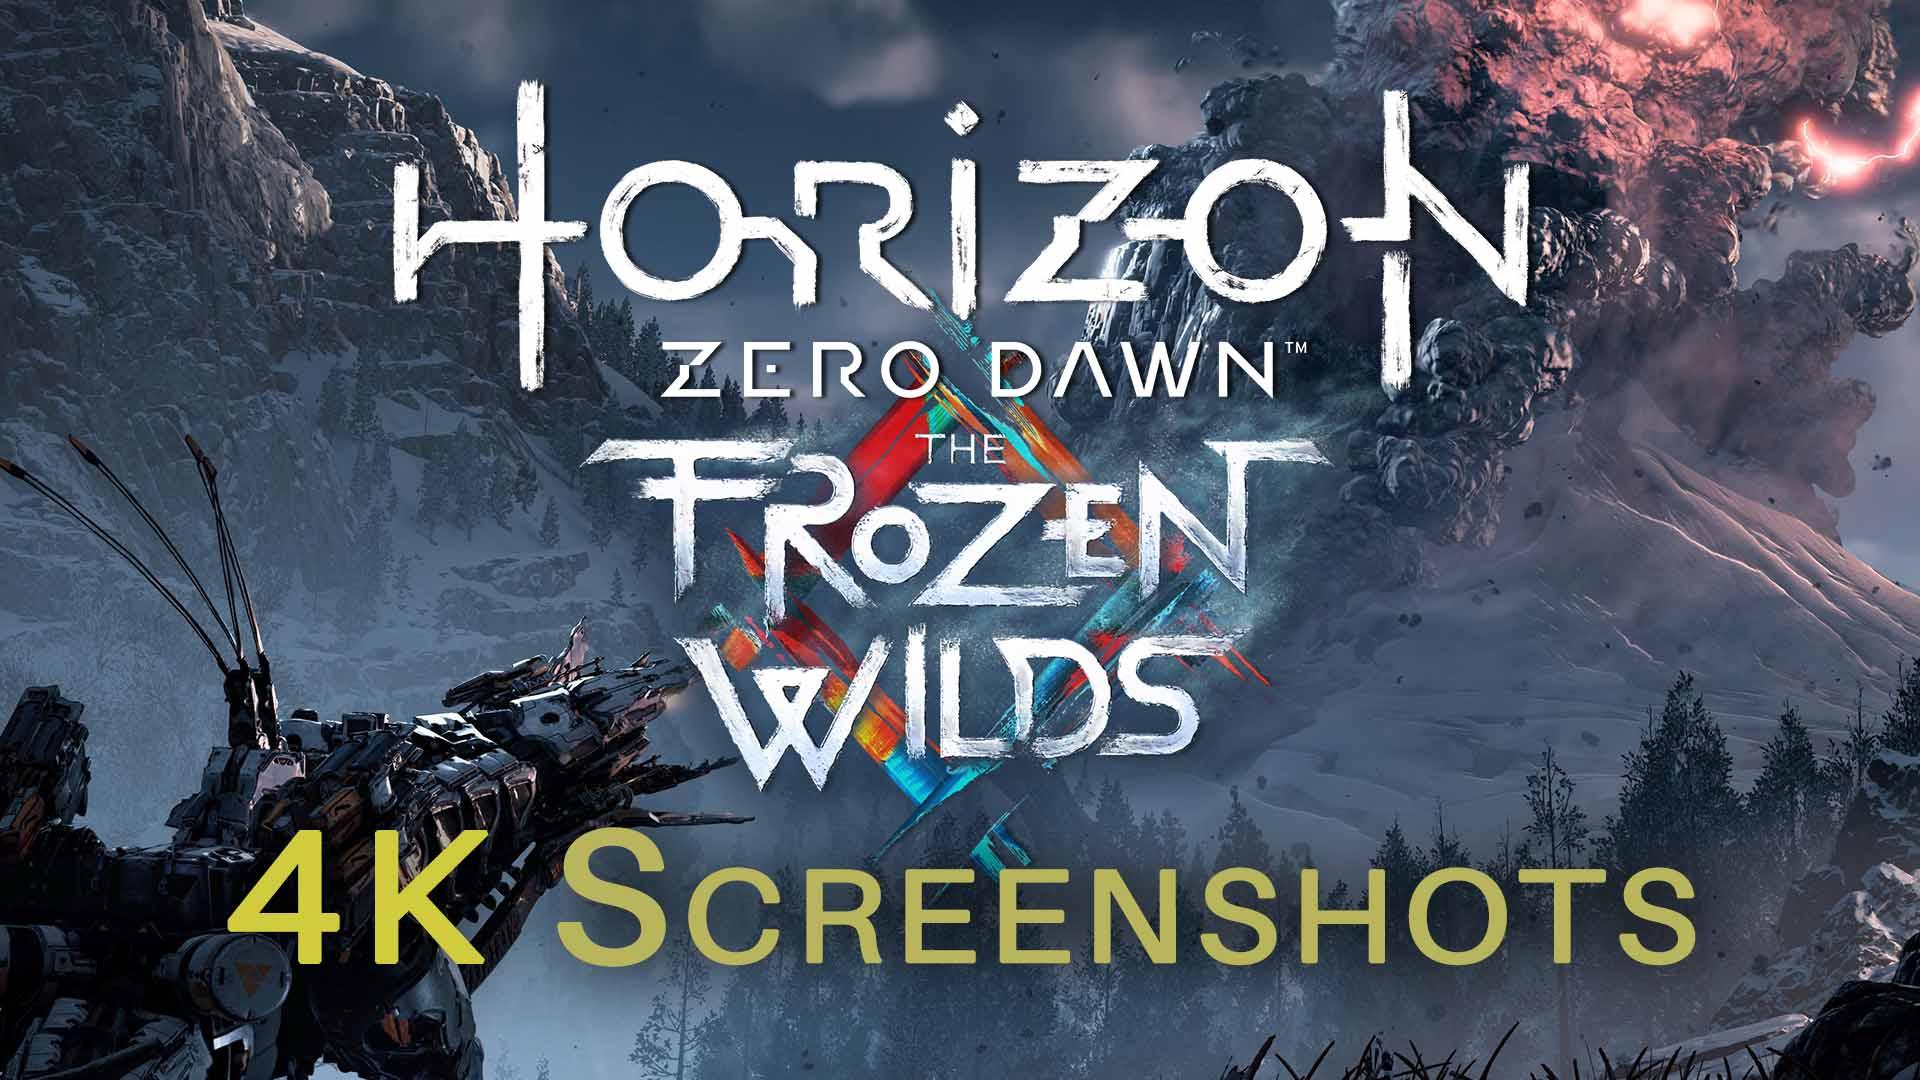 Horizon Zero Dawn The Frozen Wilds Ps4 , HD Wallpaper & Backgrounds